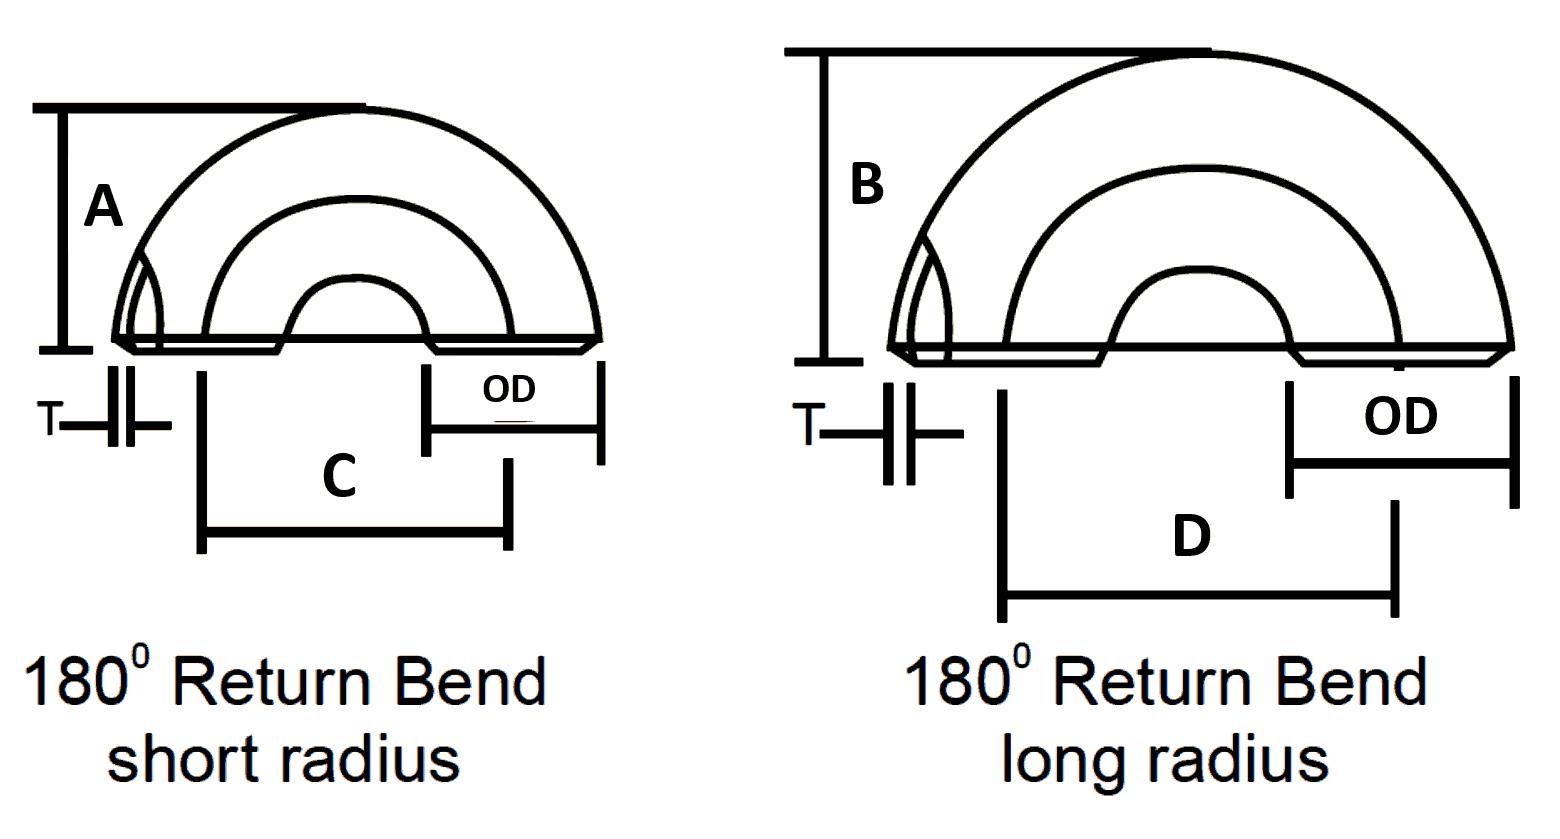 hight resolution of 180 degree returns